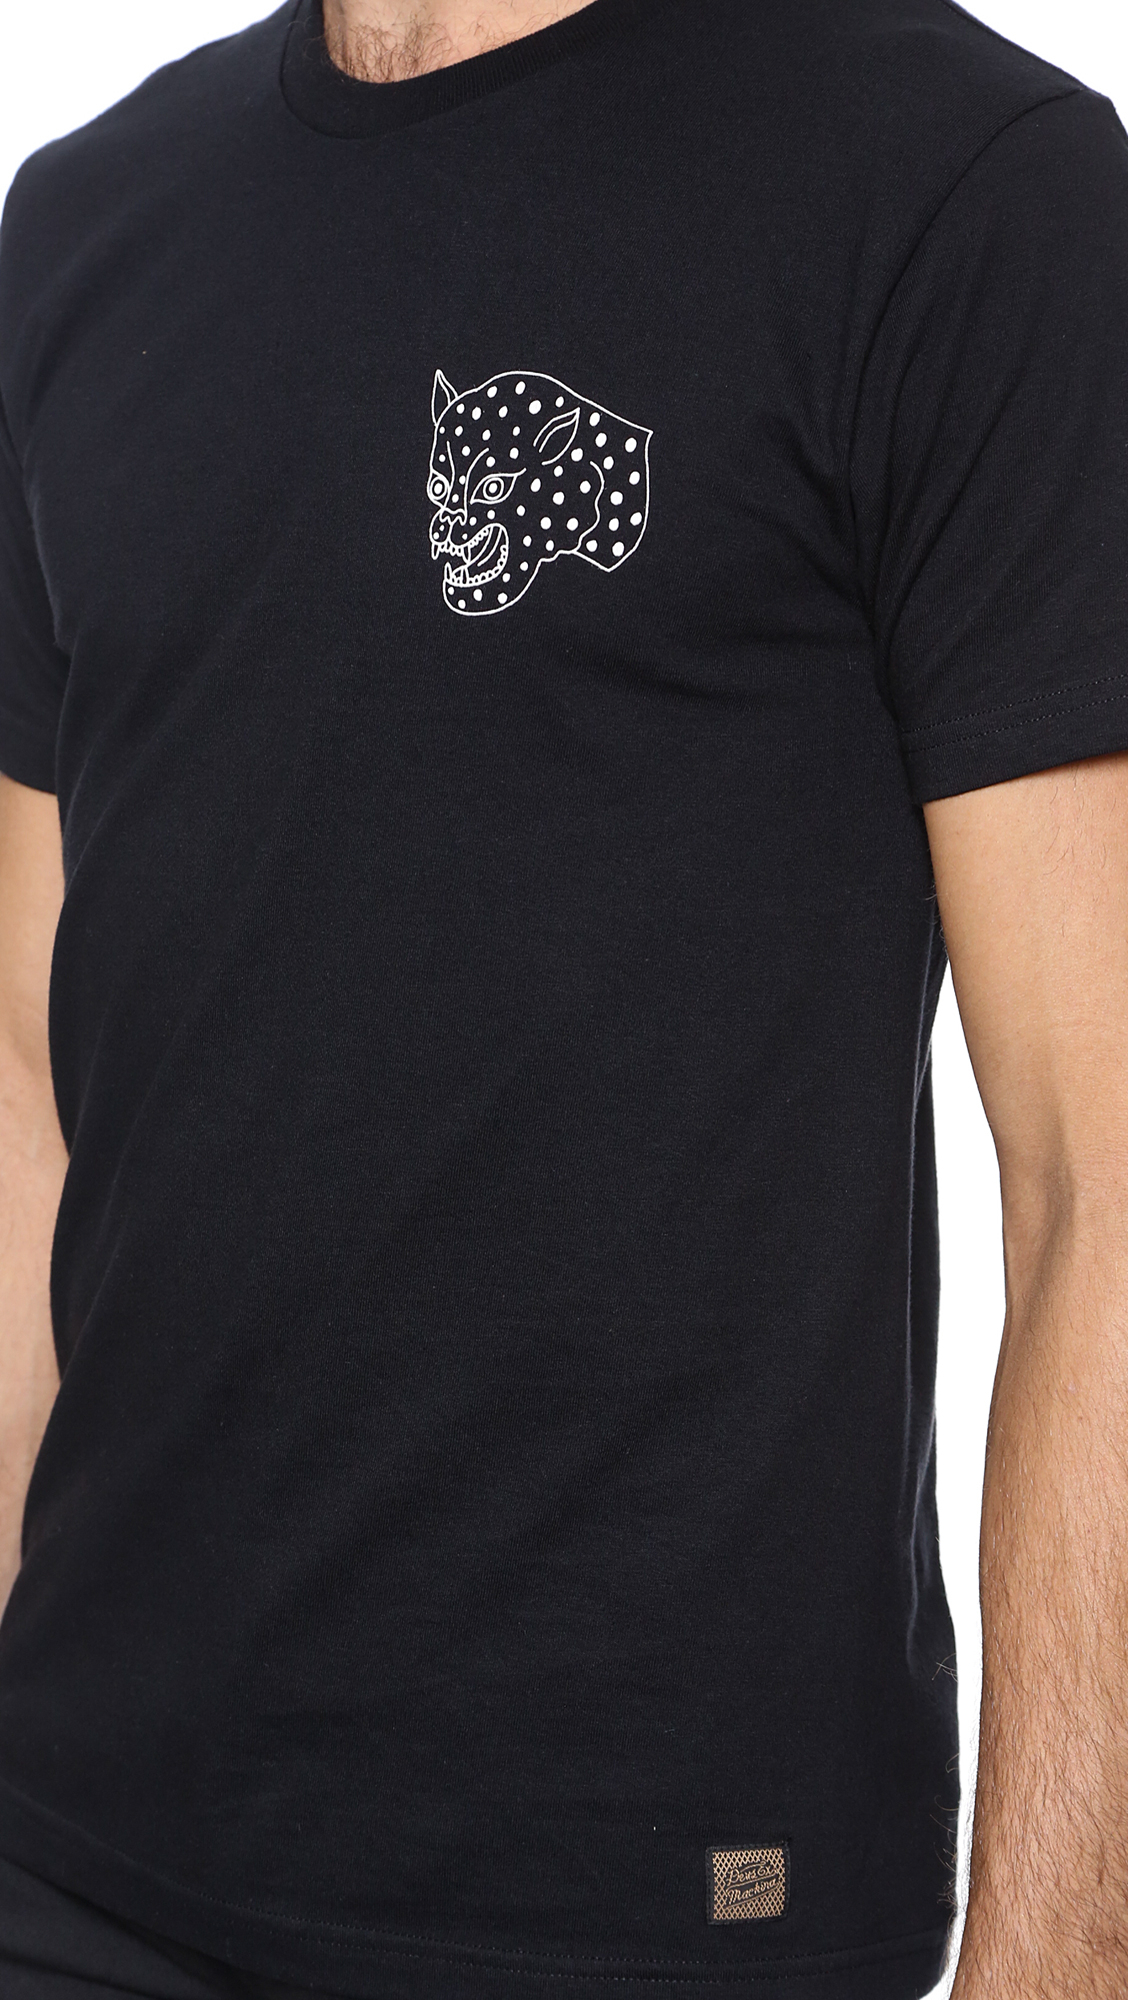 at shirts type flywheel t pin jaguar festival d shirt